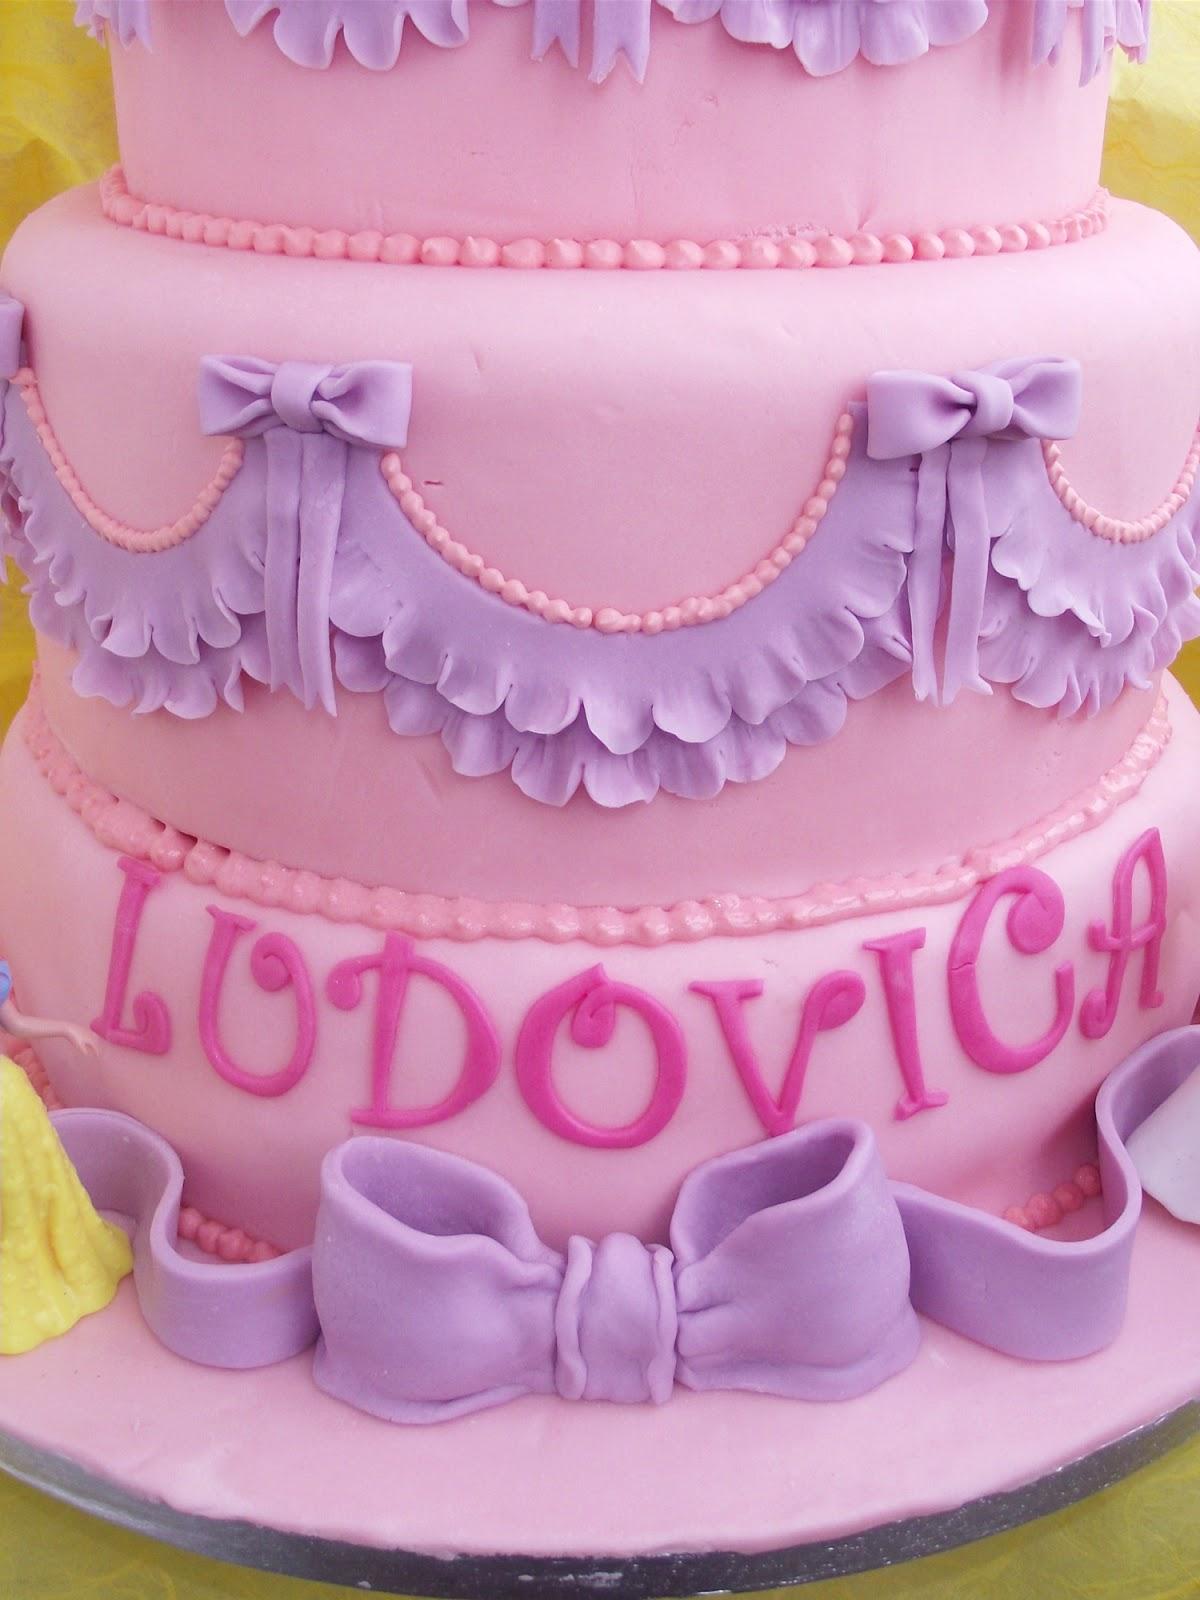 torte di principesse torta principesse : Torta Principesse Disney Cake Ideas and Designs